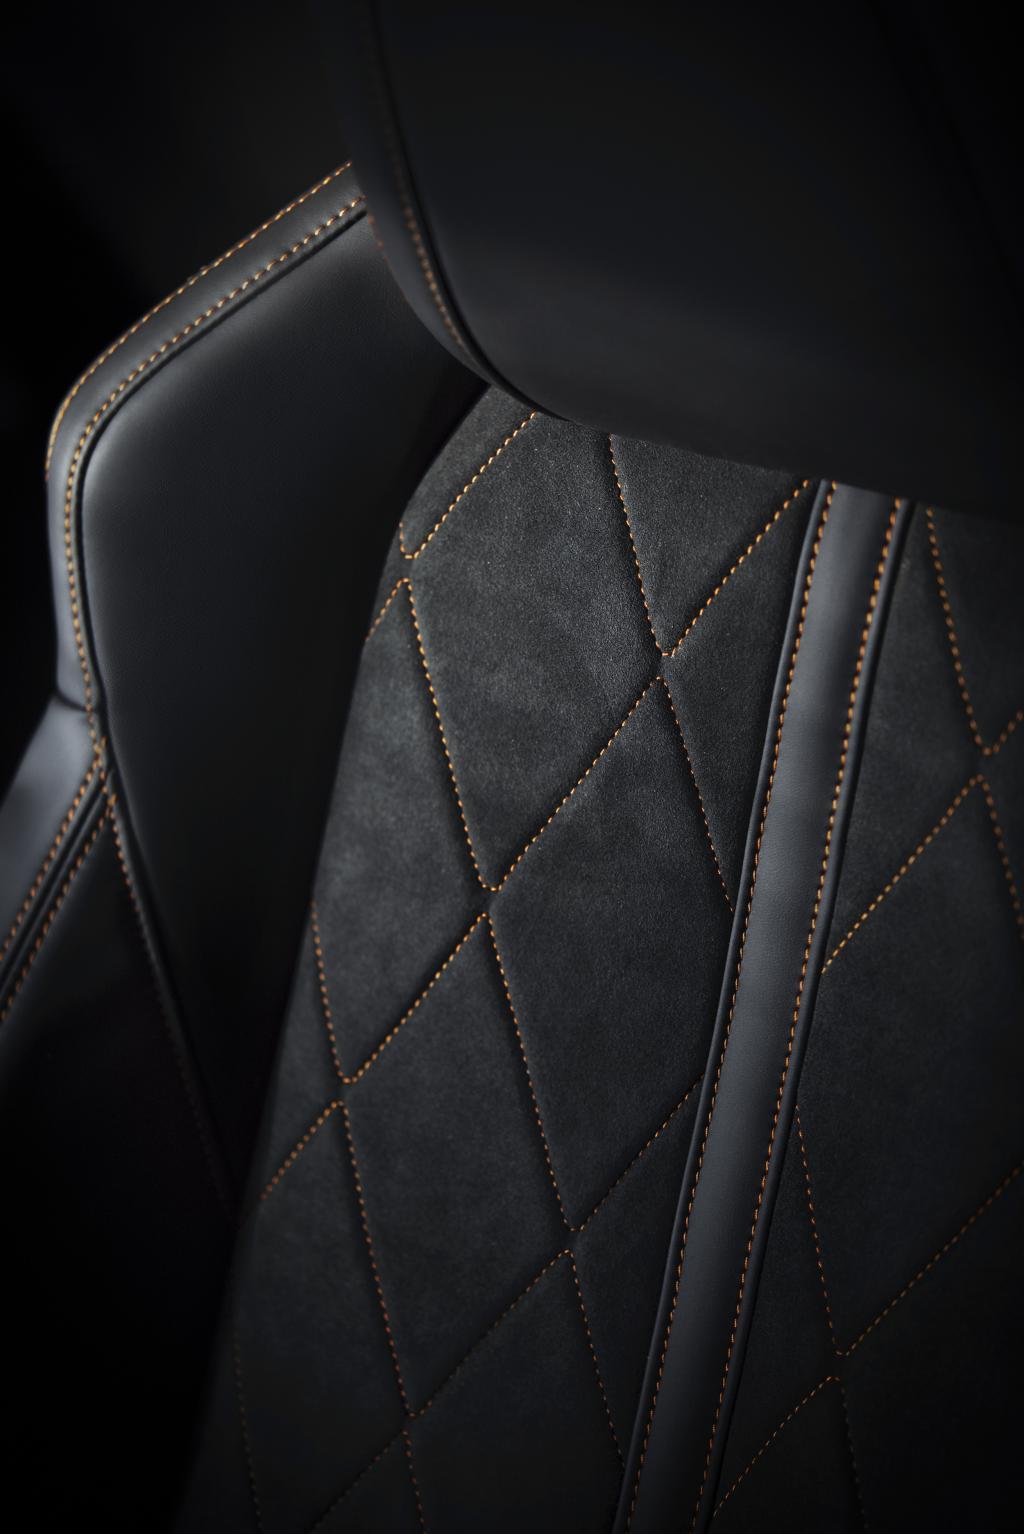 Presentación Peugeot-3008--GT-Line-2016-motorpoint-fotos-HD10